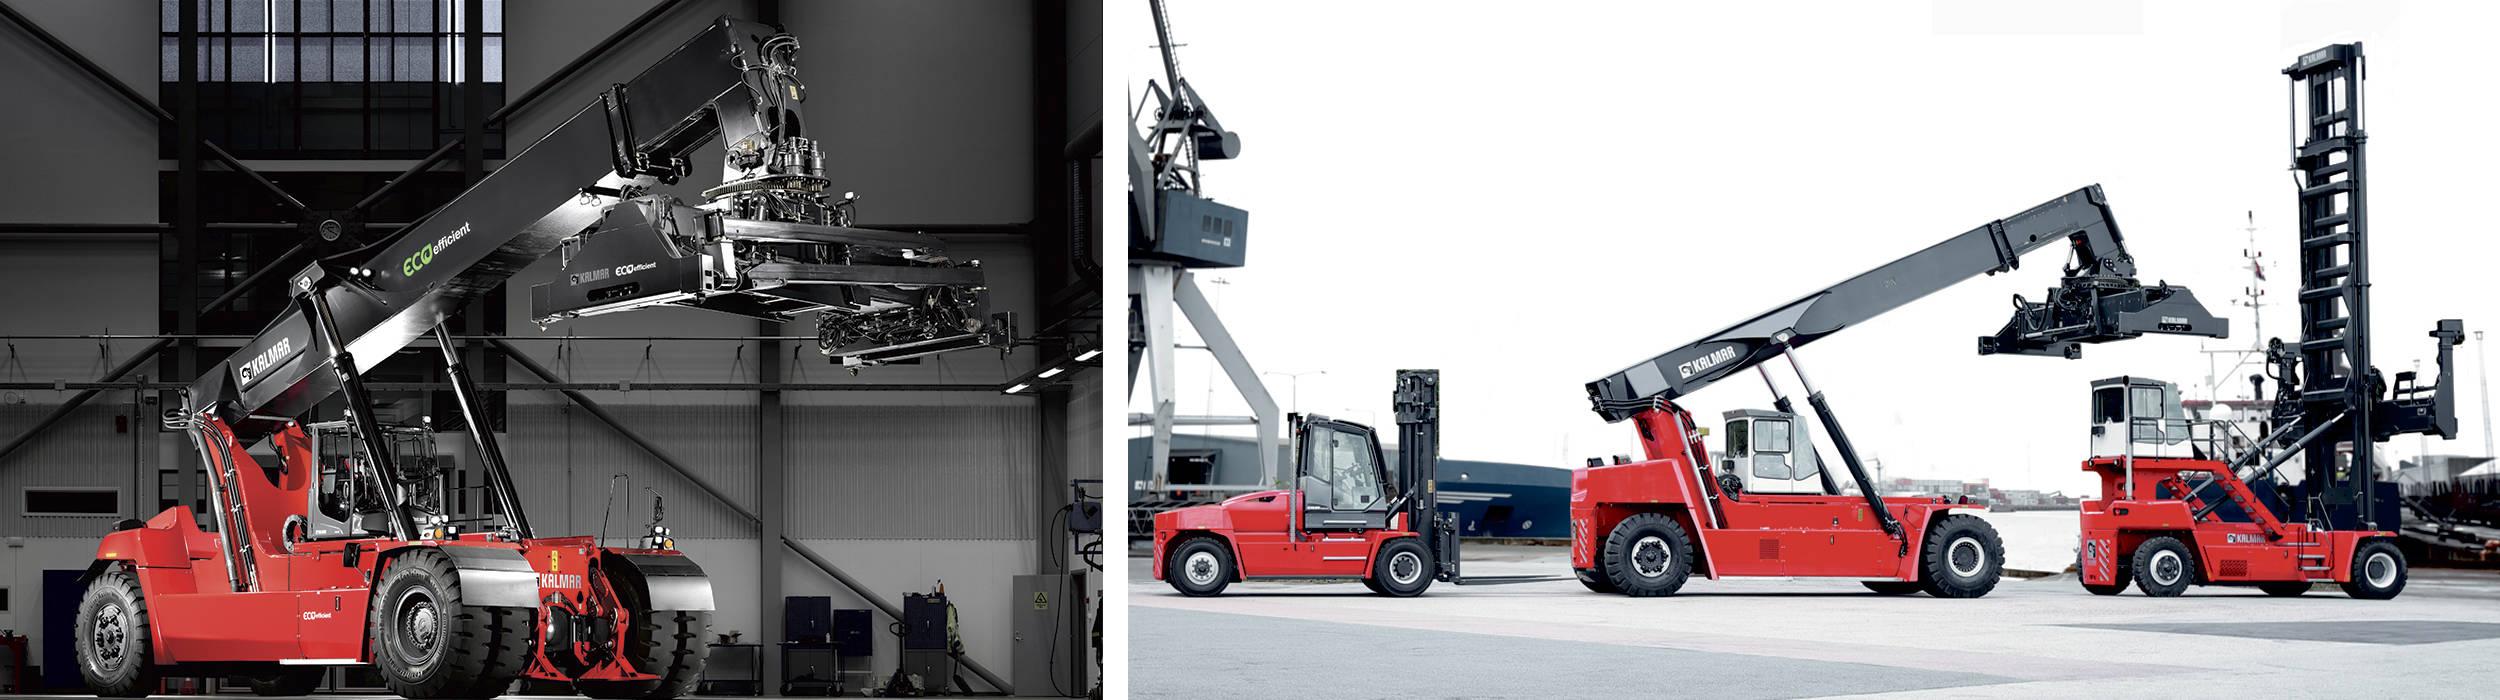 Kalmar truck og reachstacker, en stor gaffeltruck, terminaltrækker og containertruck